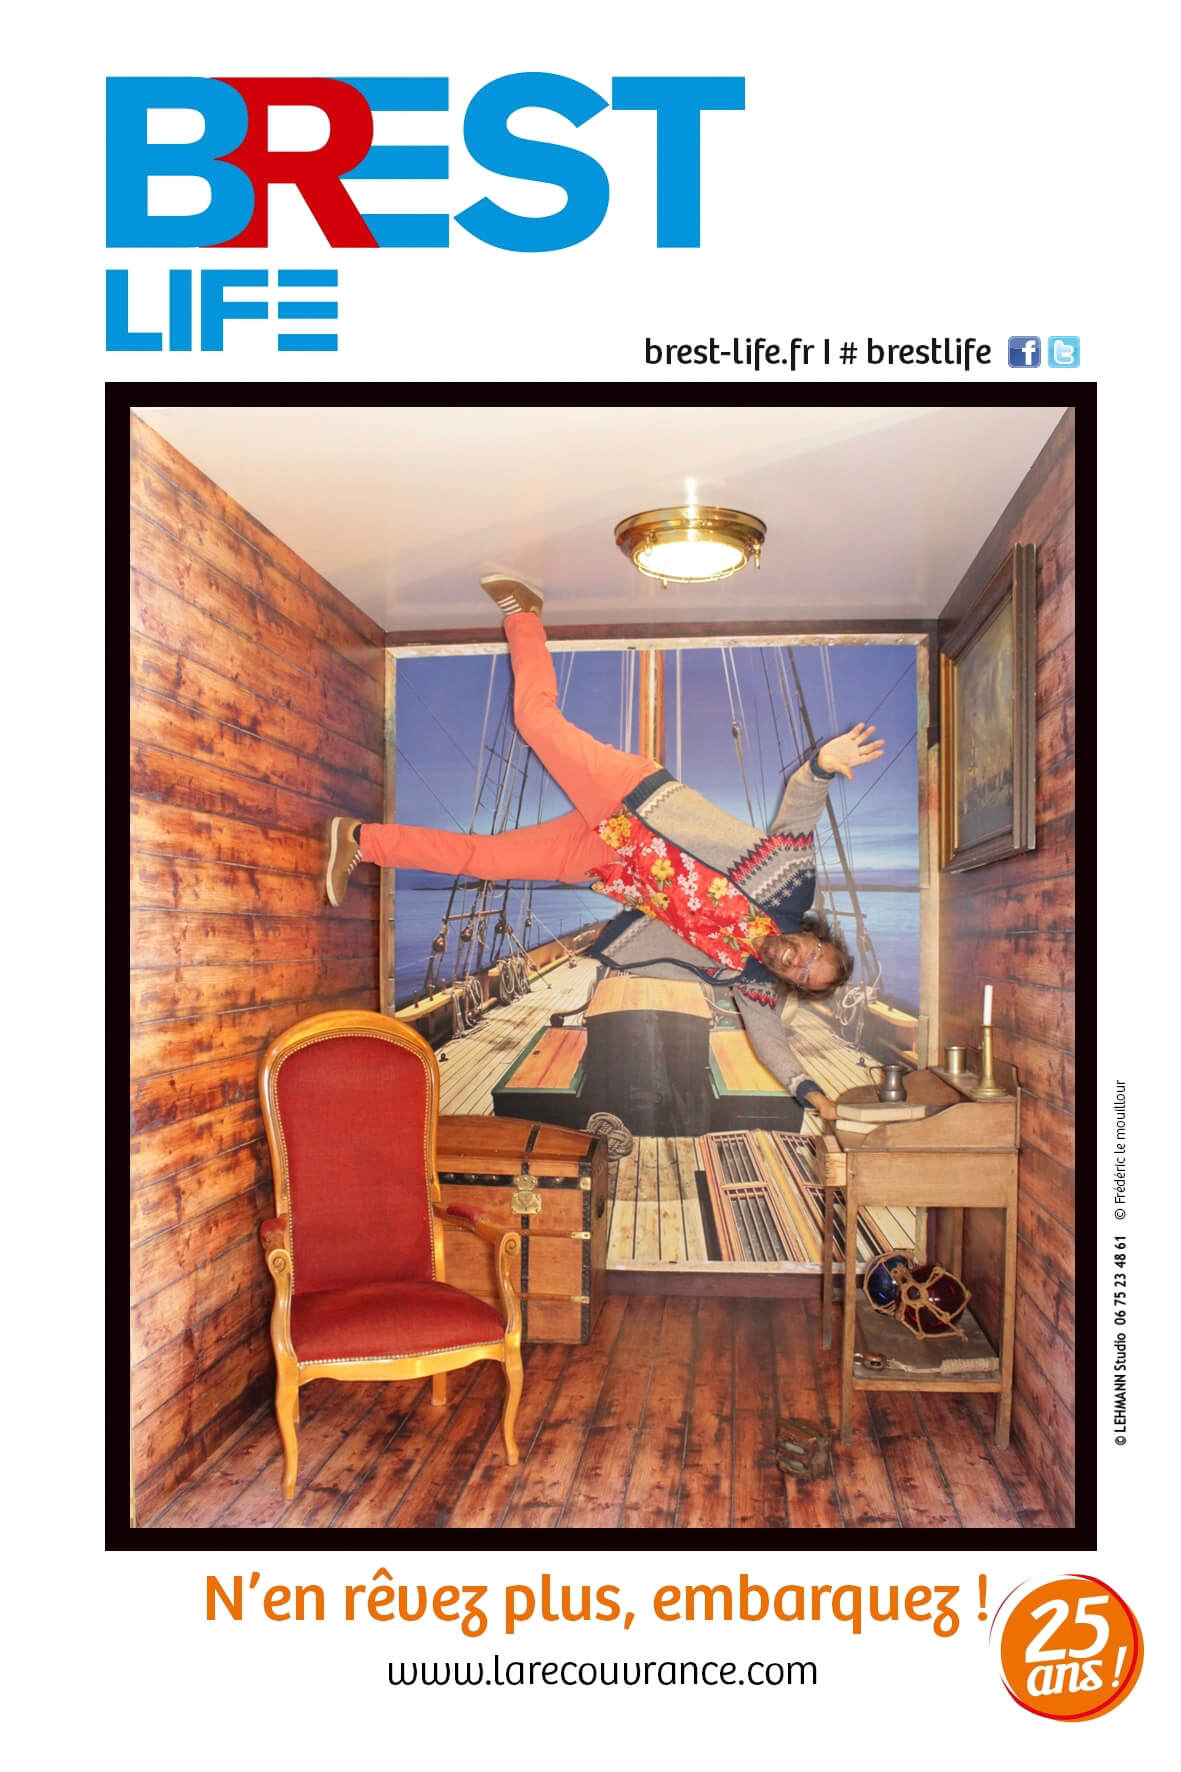 lehman-studio-photographe-angers-evenementiel-gravitybox-ambiance-bateau-brest-life